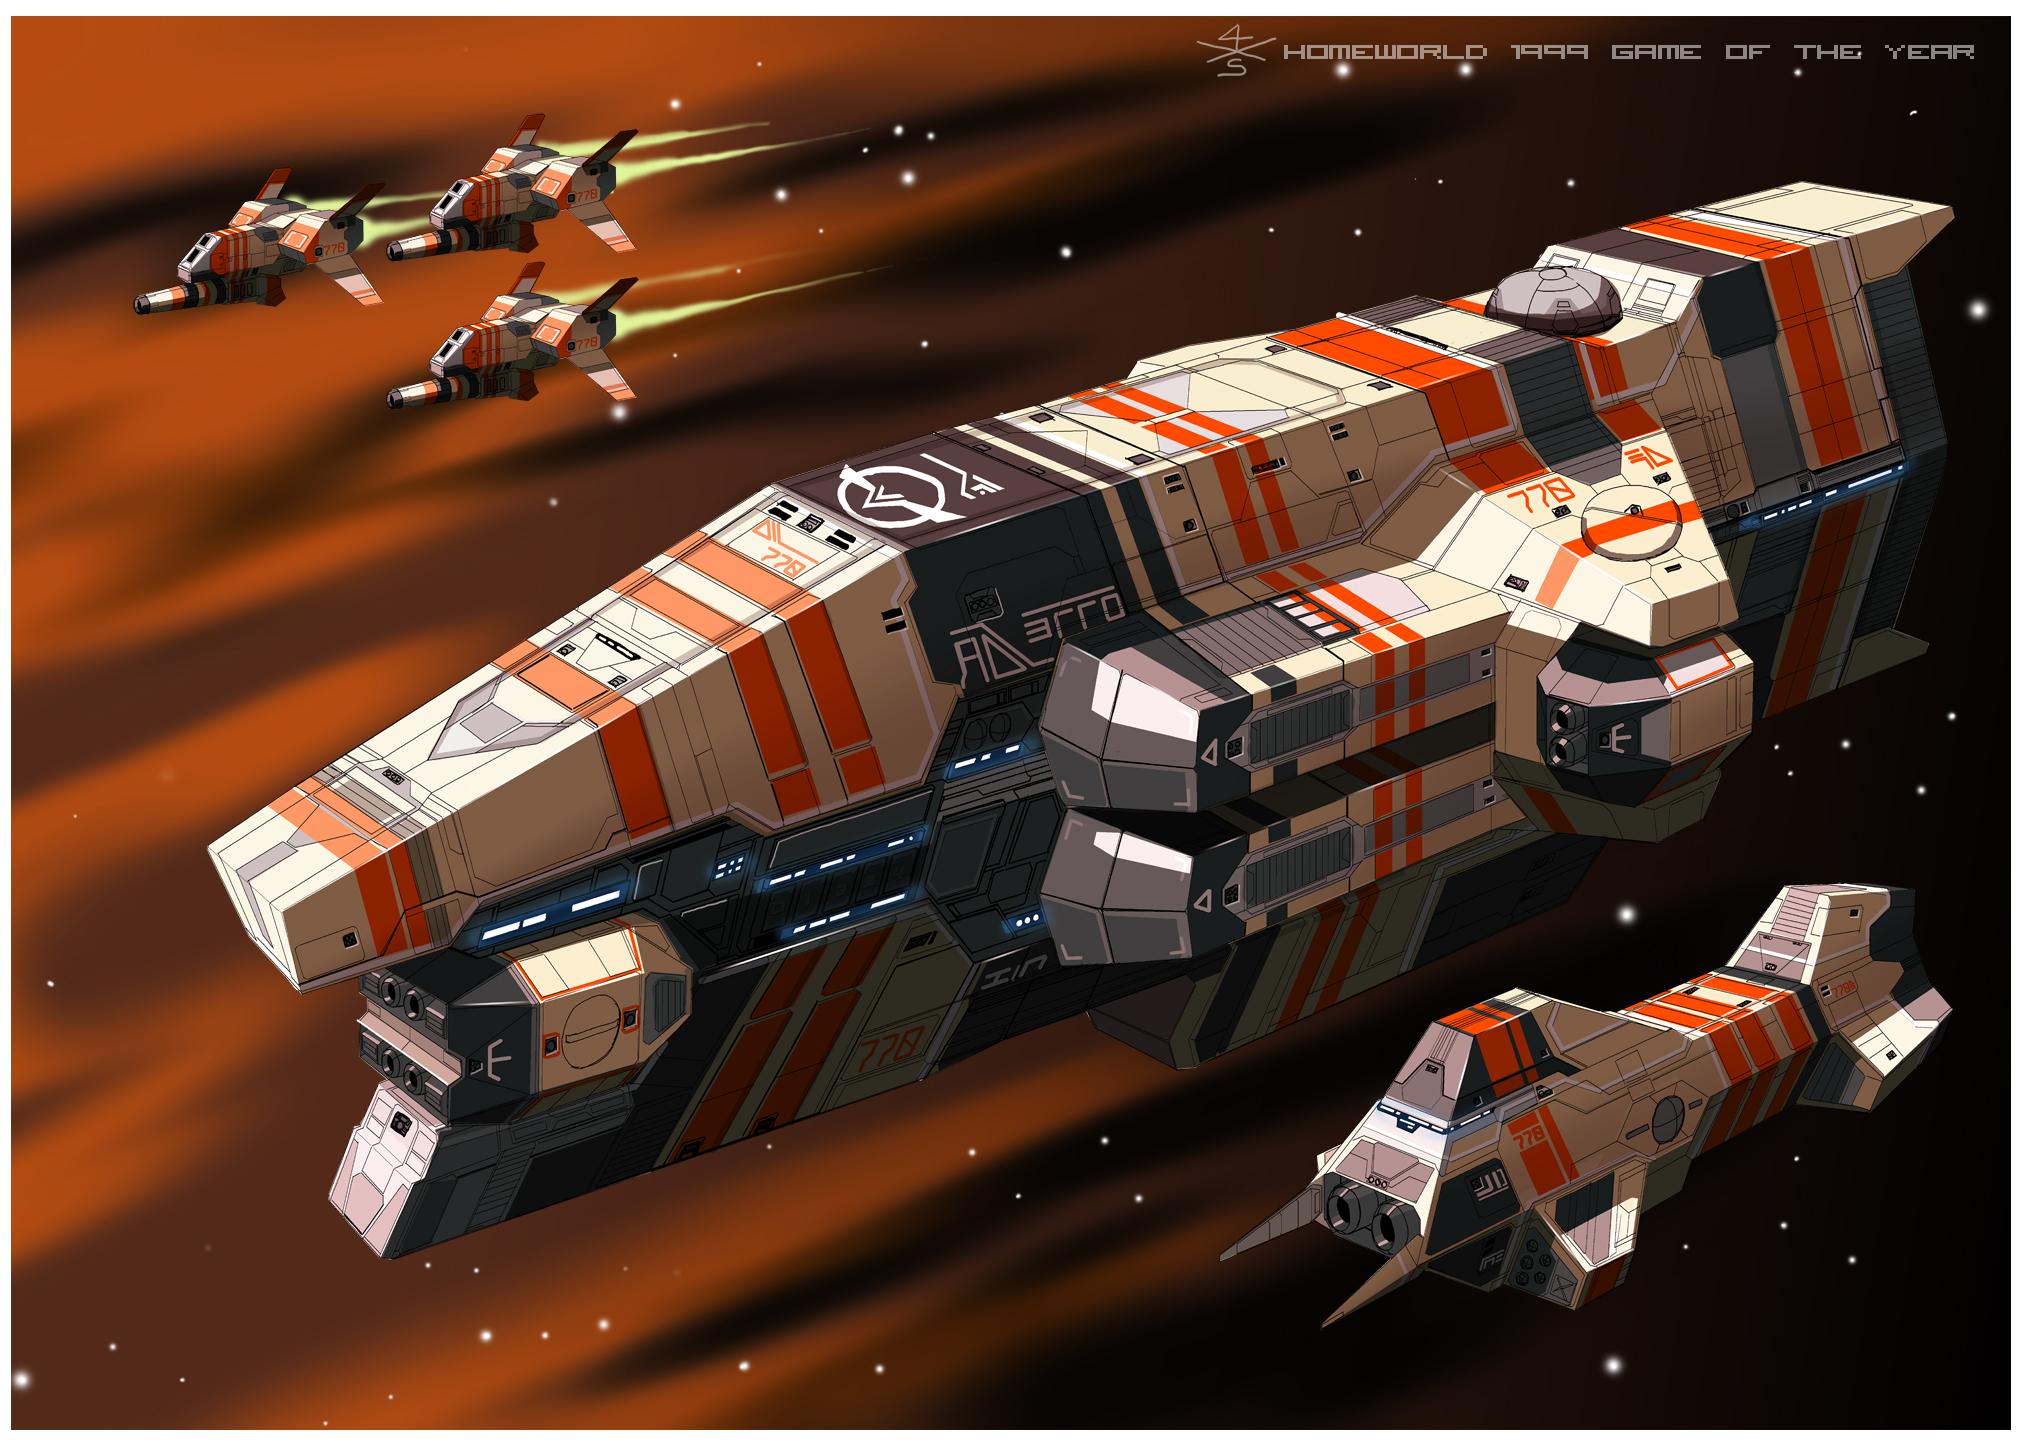 Taiidan Heavy Cruiser of Homeworld1 [frameA] by myname1z4xs